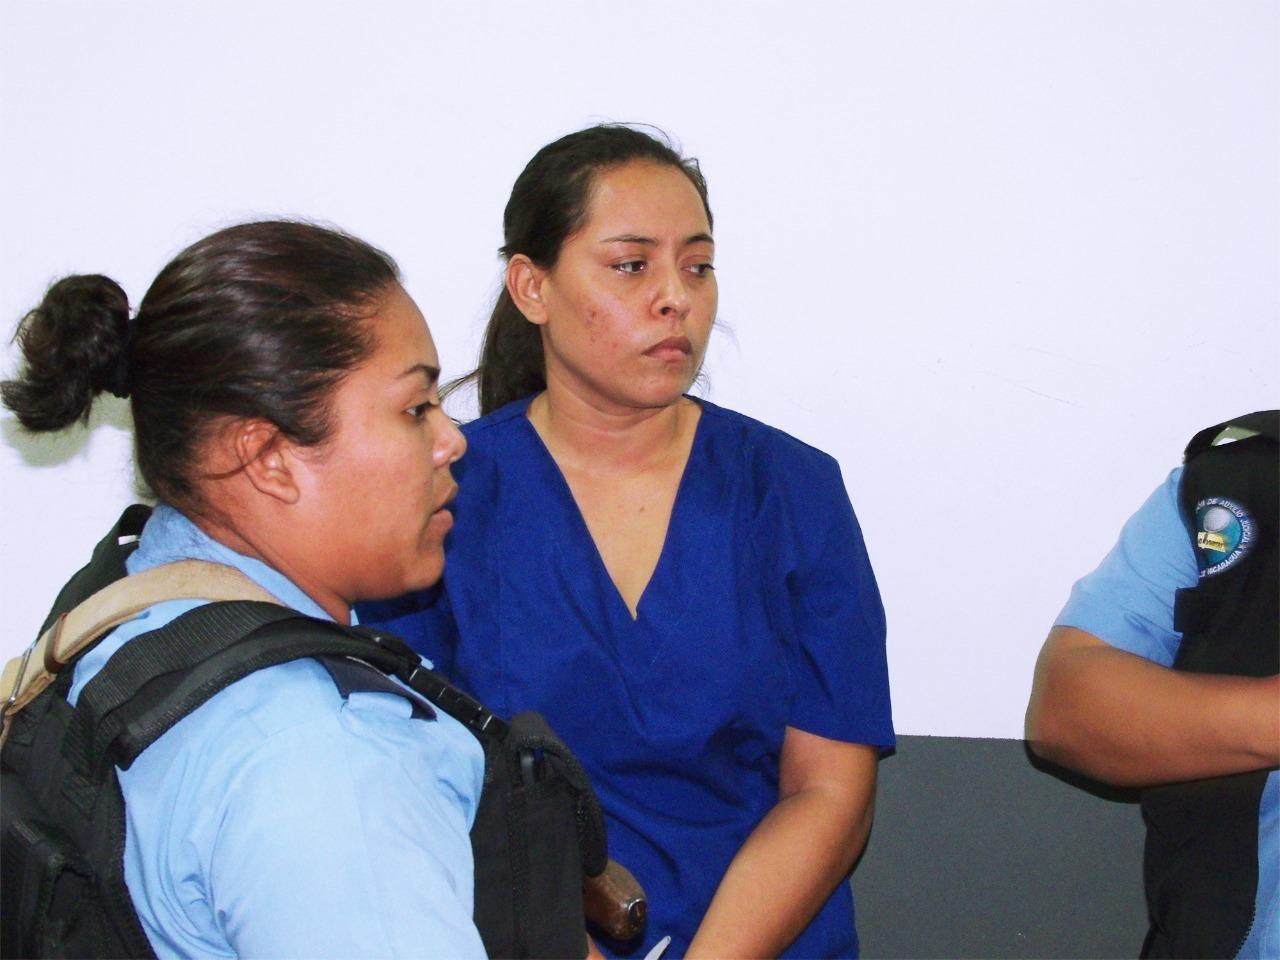 Admiten acusación contra mujer señalada por narcotráfico.